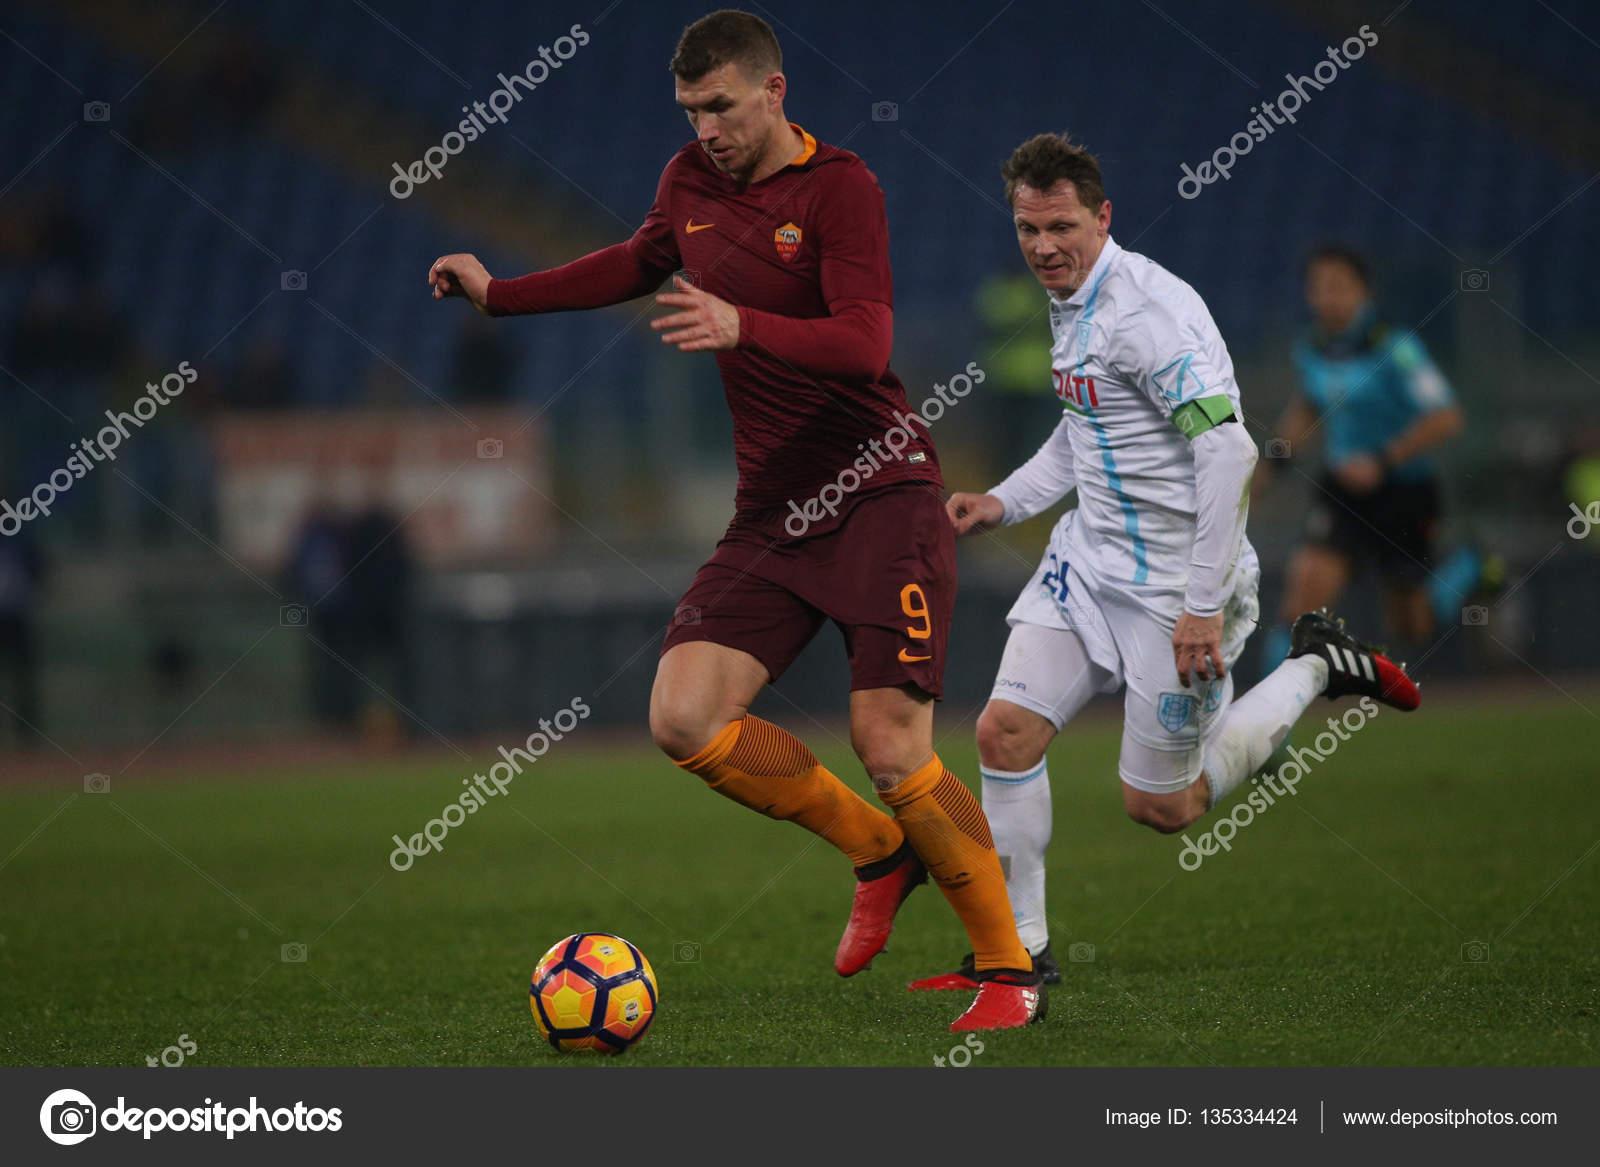 Картинки футбол а. с. рома